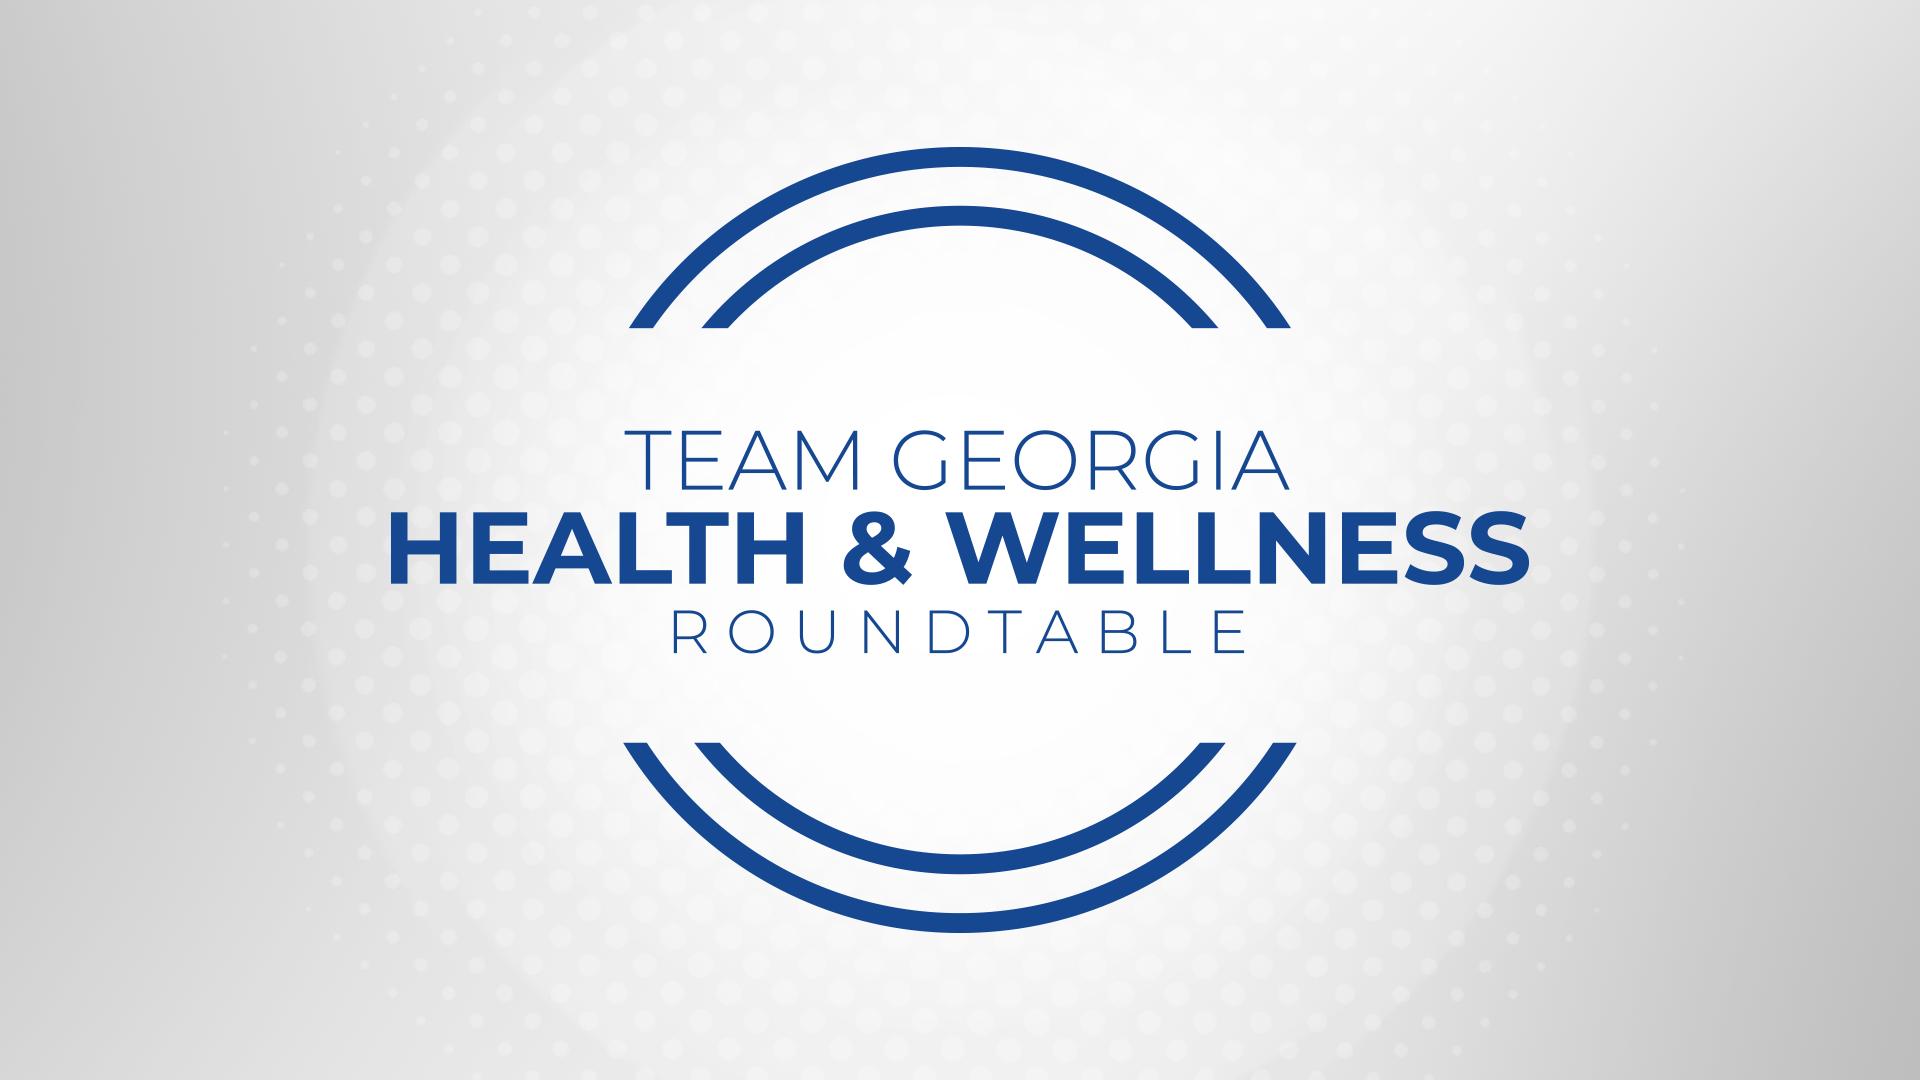 Team Georgia Health & Wellness Roundtable